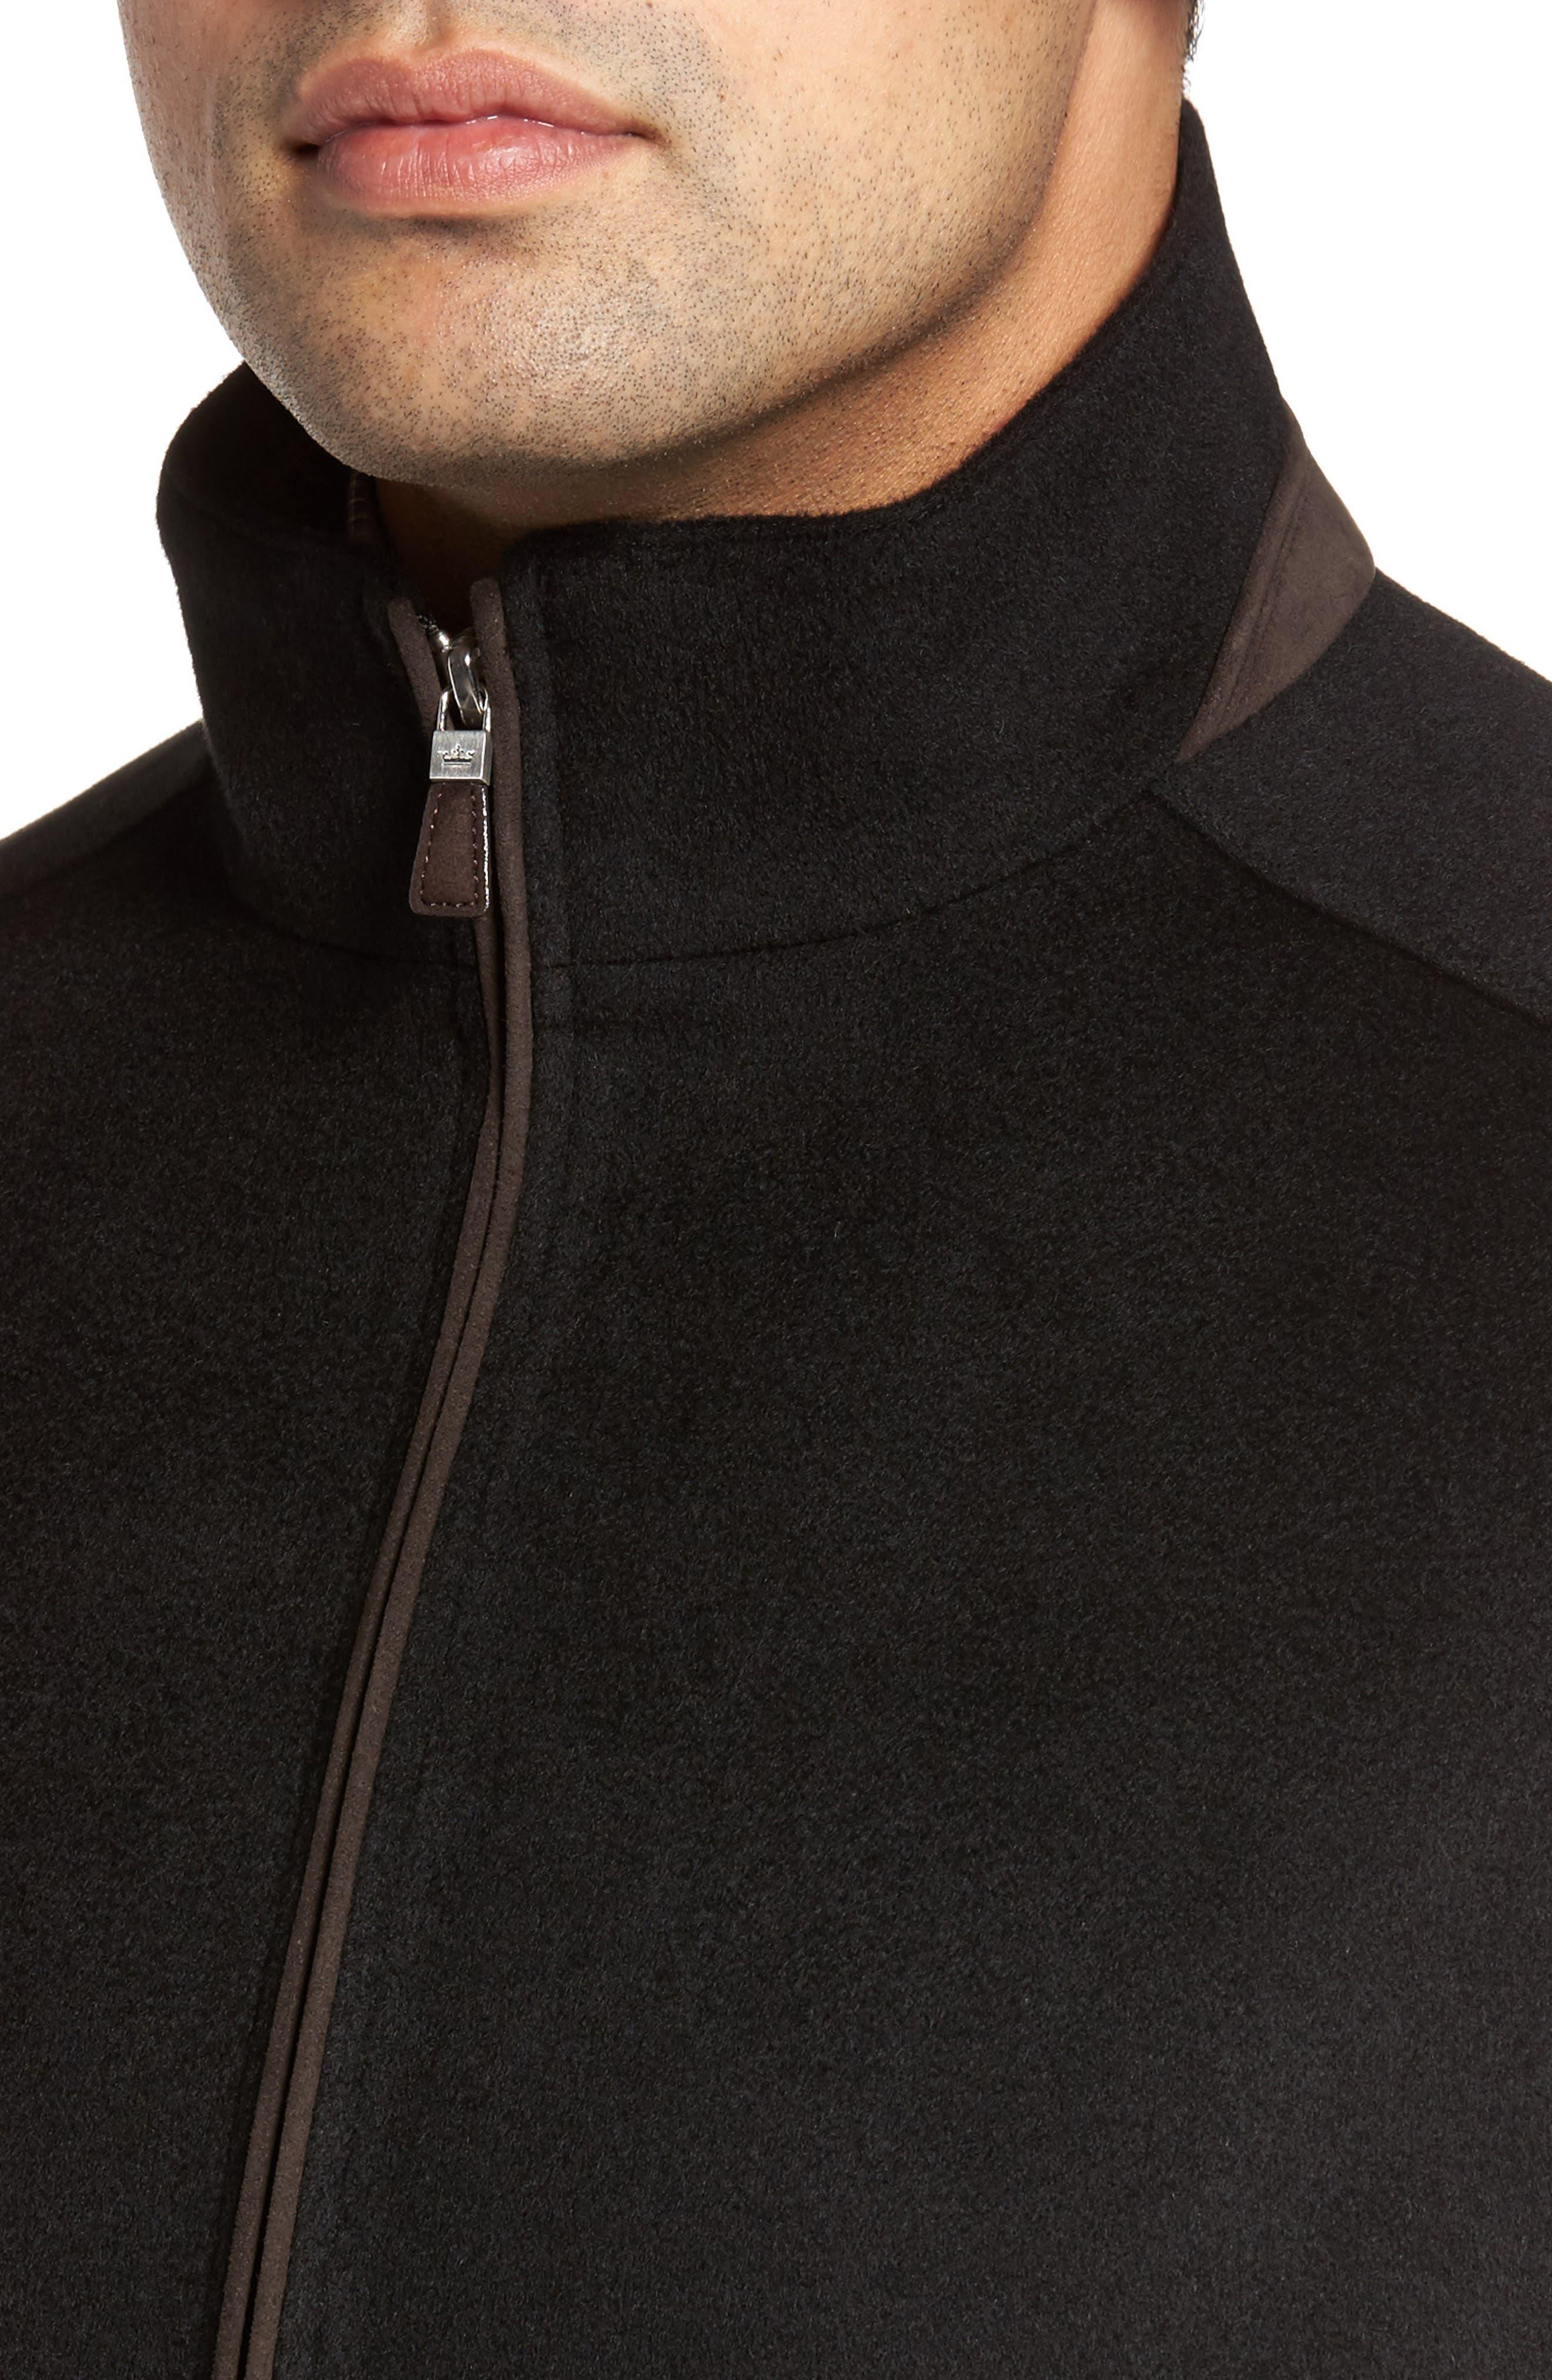 Westport Wool & Cashmere Jacket,                             Alternate thumbnail 10, color,